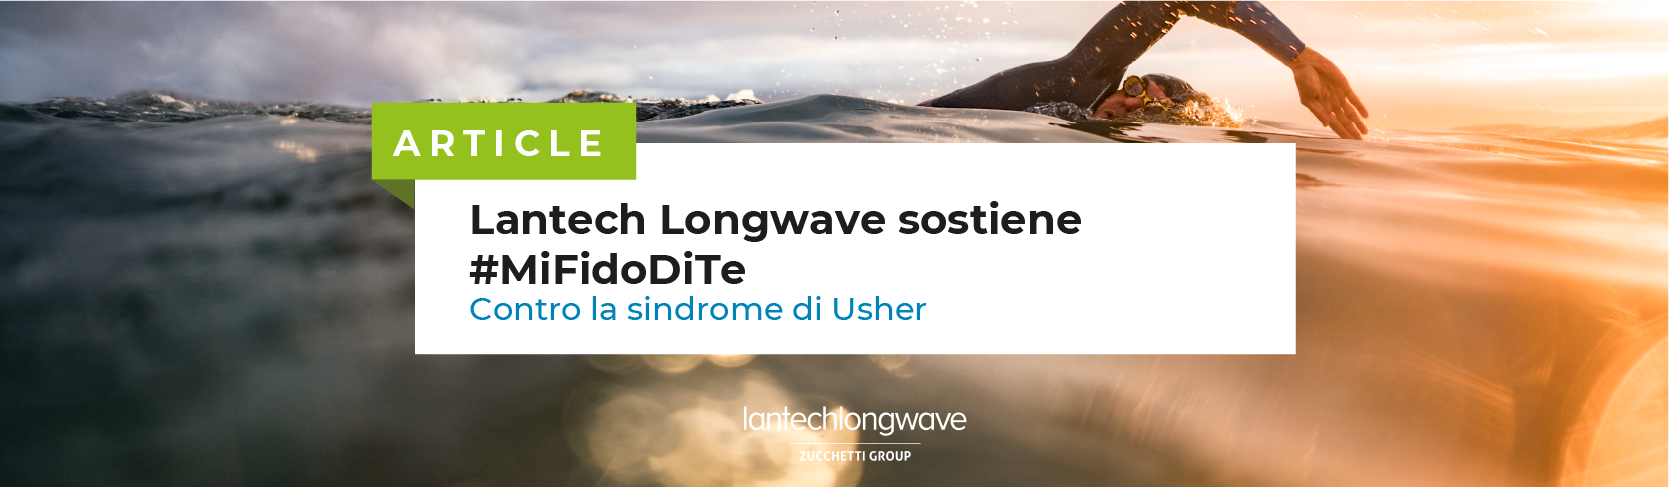 Lantech Longwave sostiene #MiFidoDiTe contro la sindrome di Usher